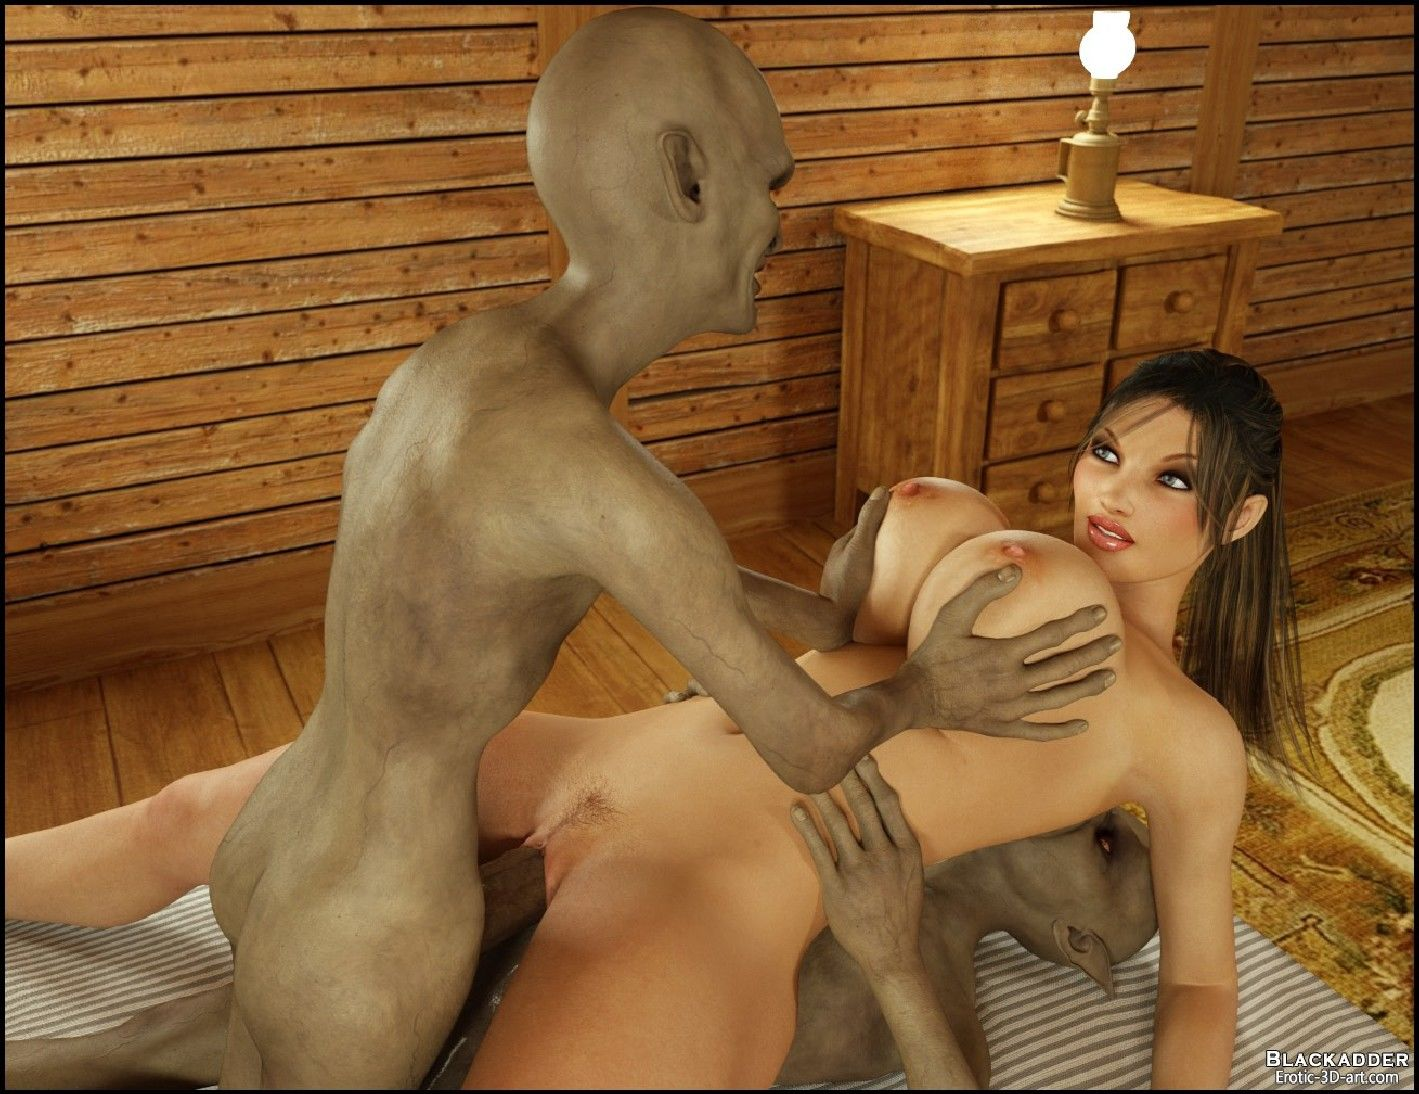 Порно картинки в формате 3d